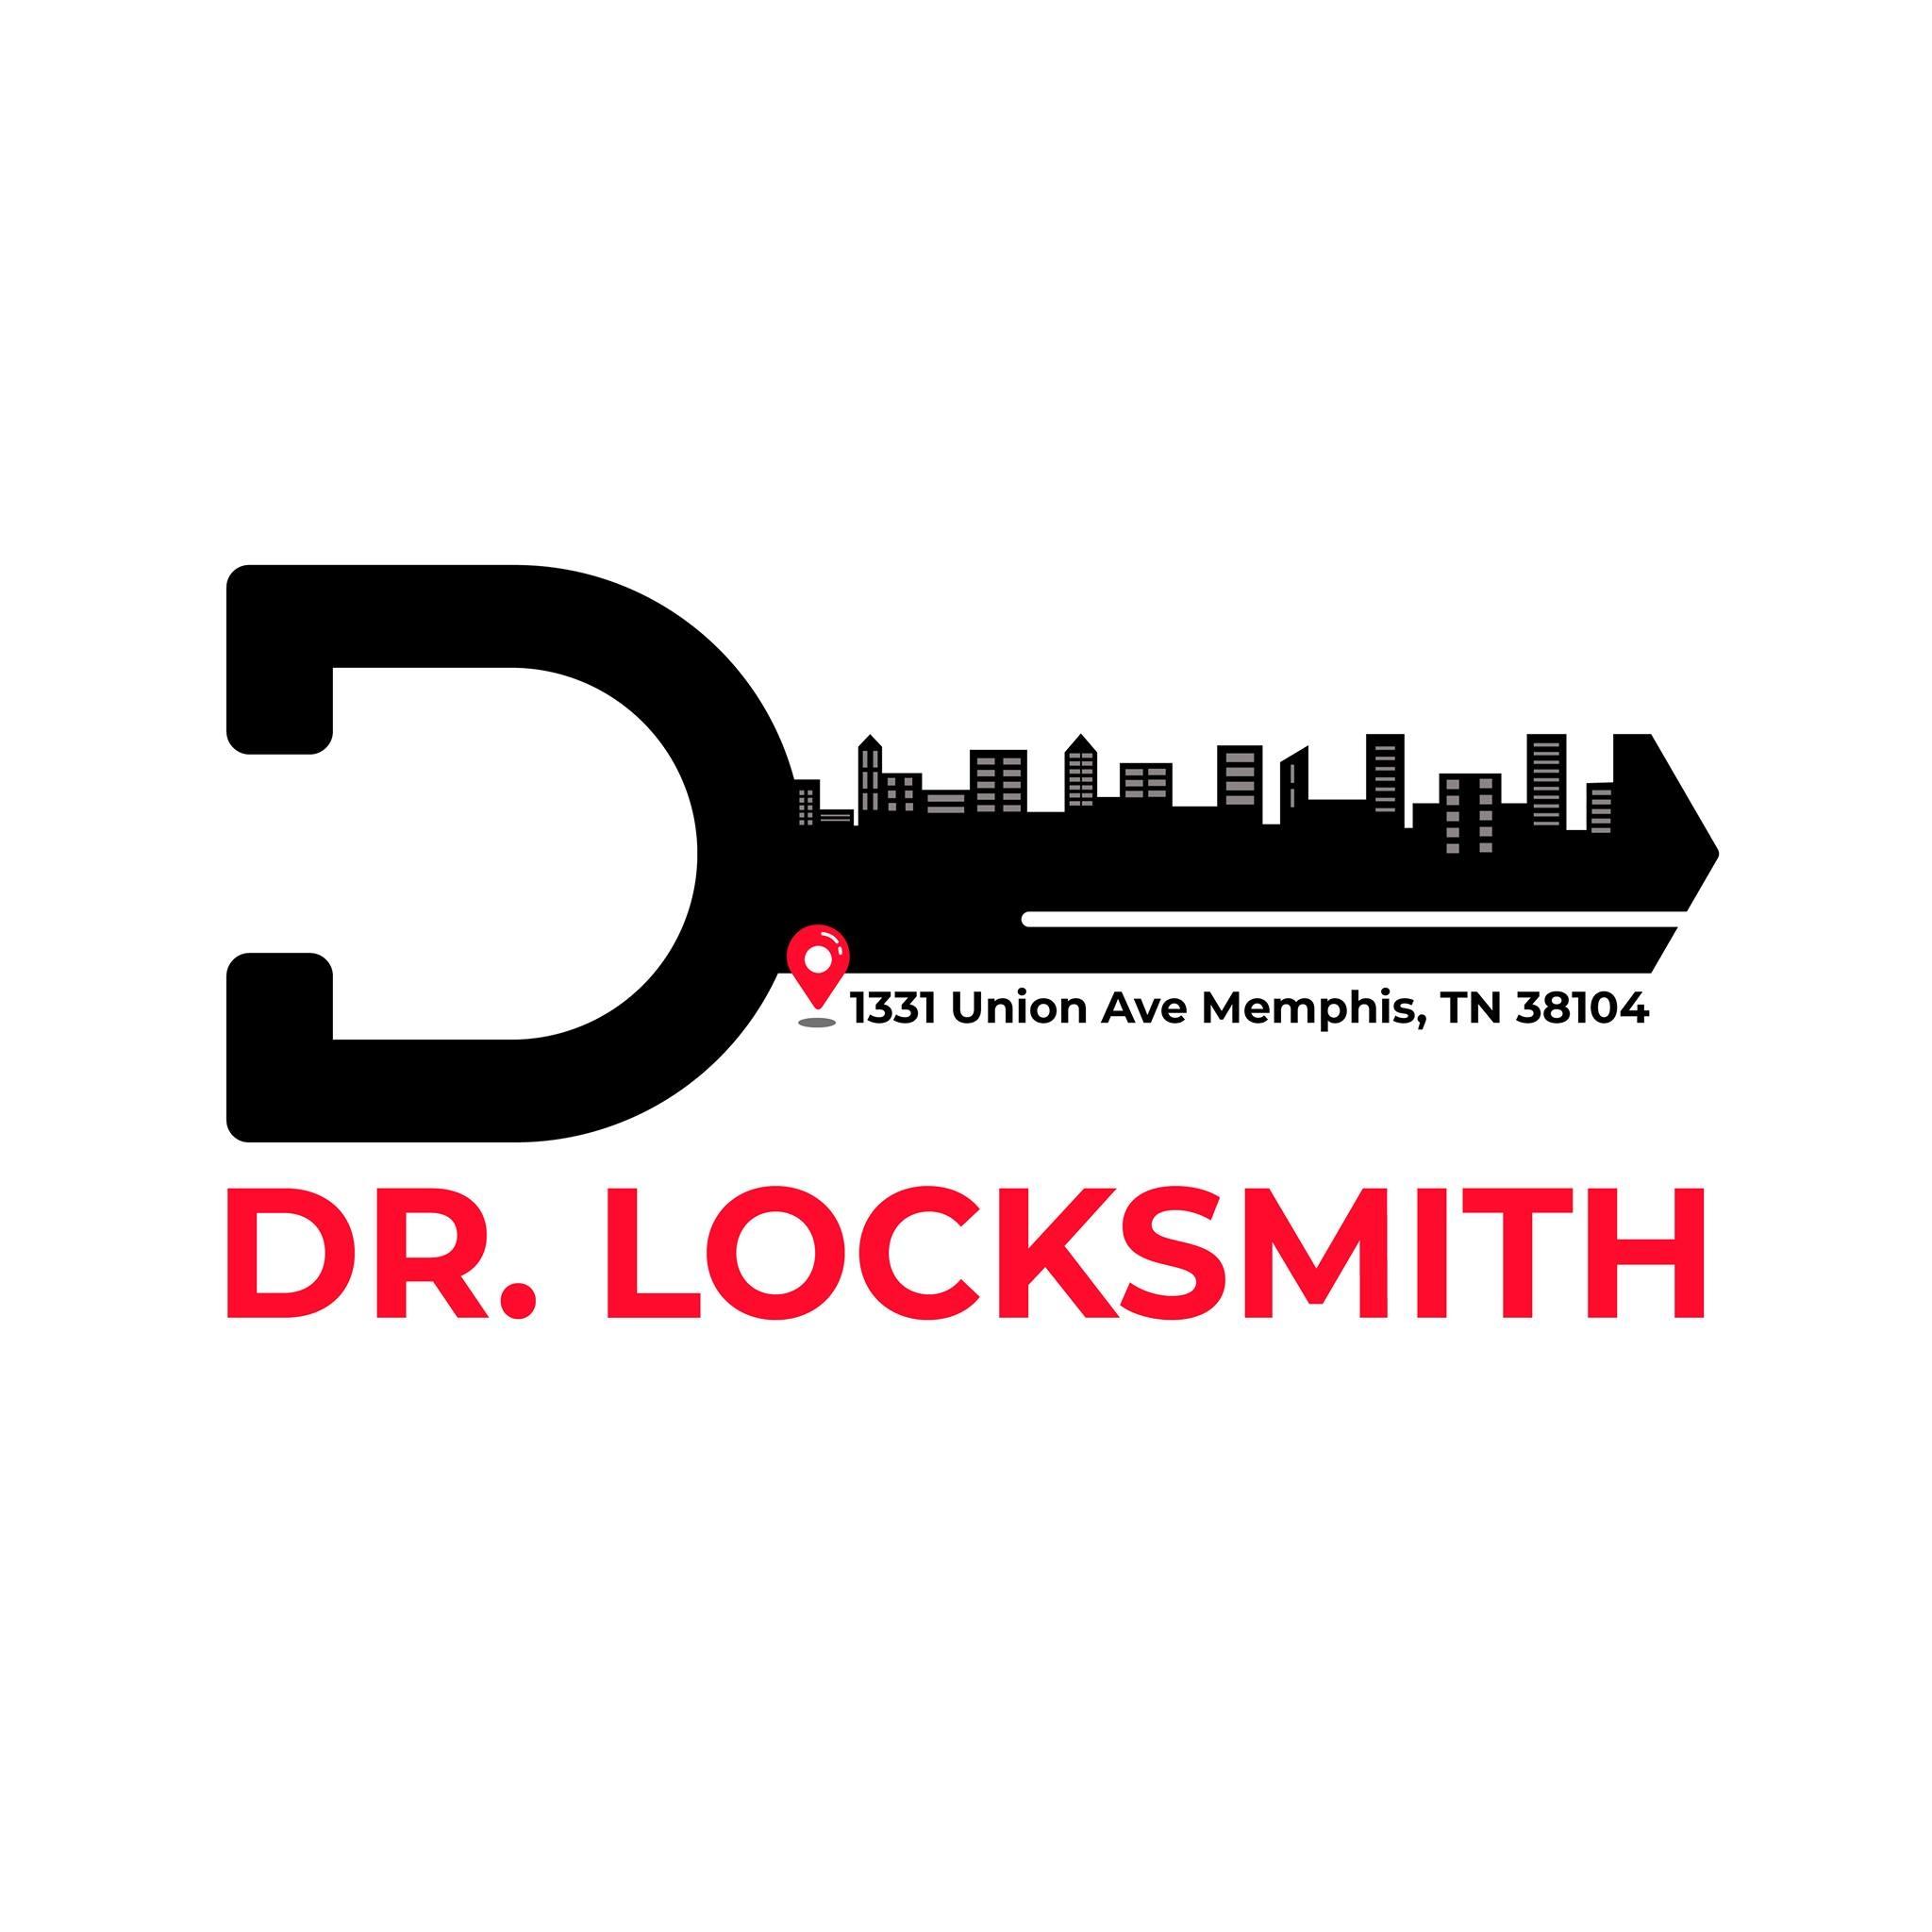 Doctor Locksmith Memphis